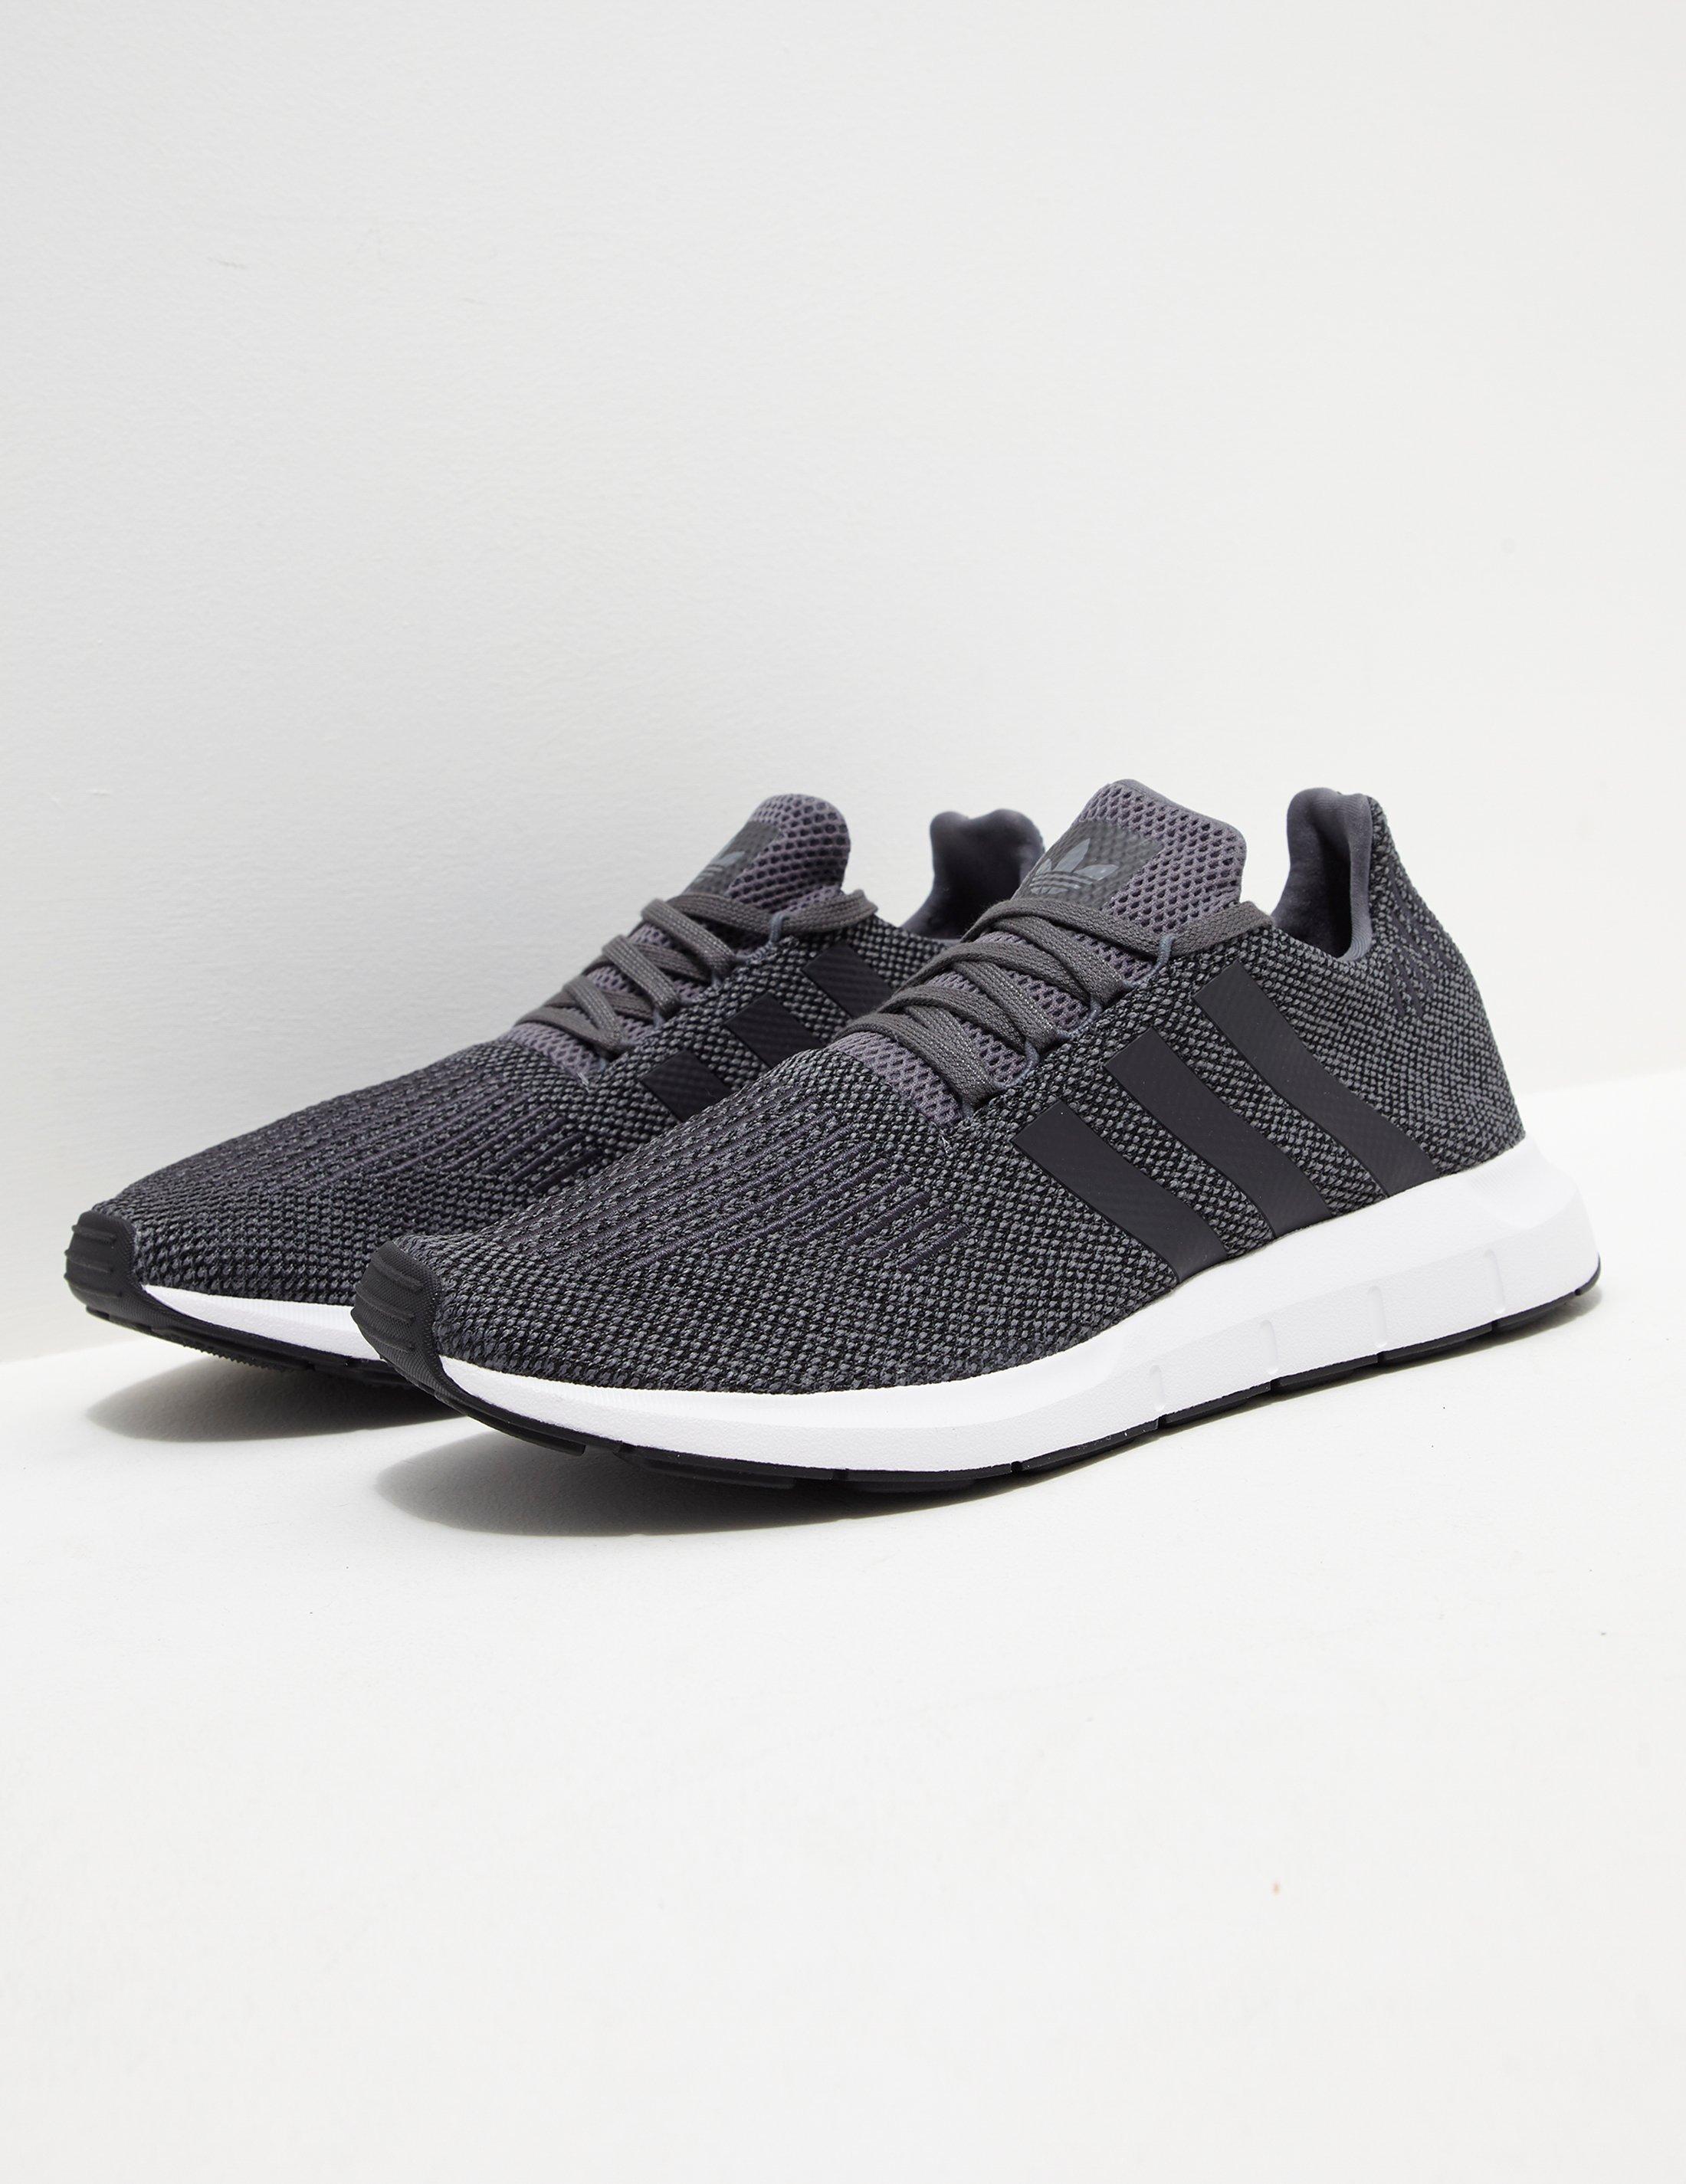 adidas Originals Mens Swift Run Grey white in Gray for Men - Lyst b9feacb1b